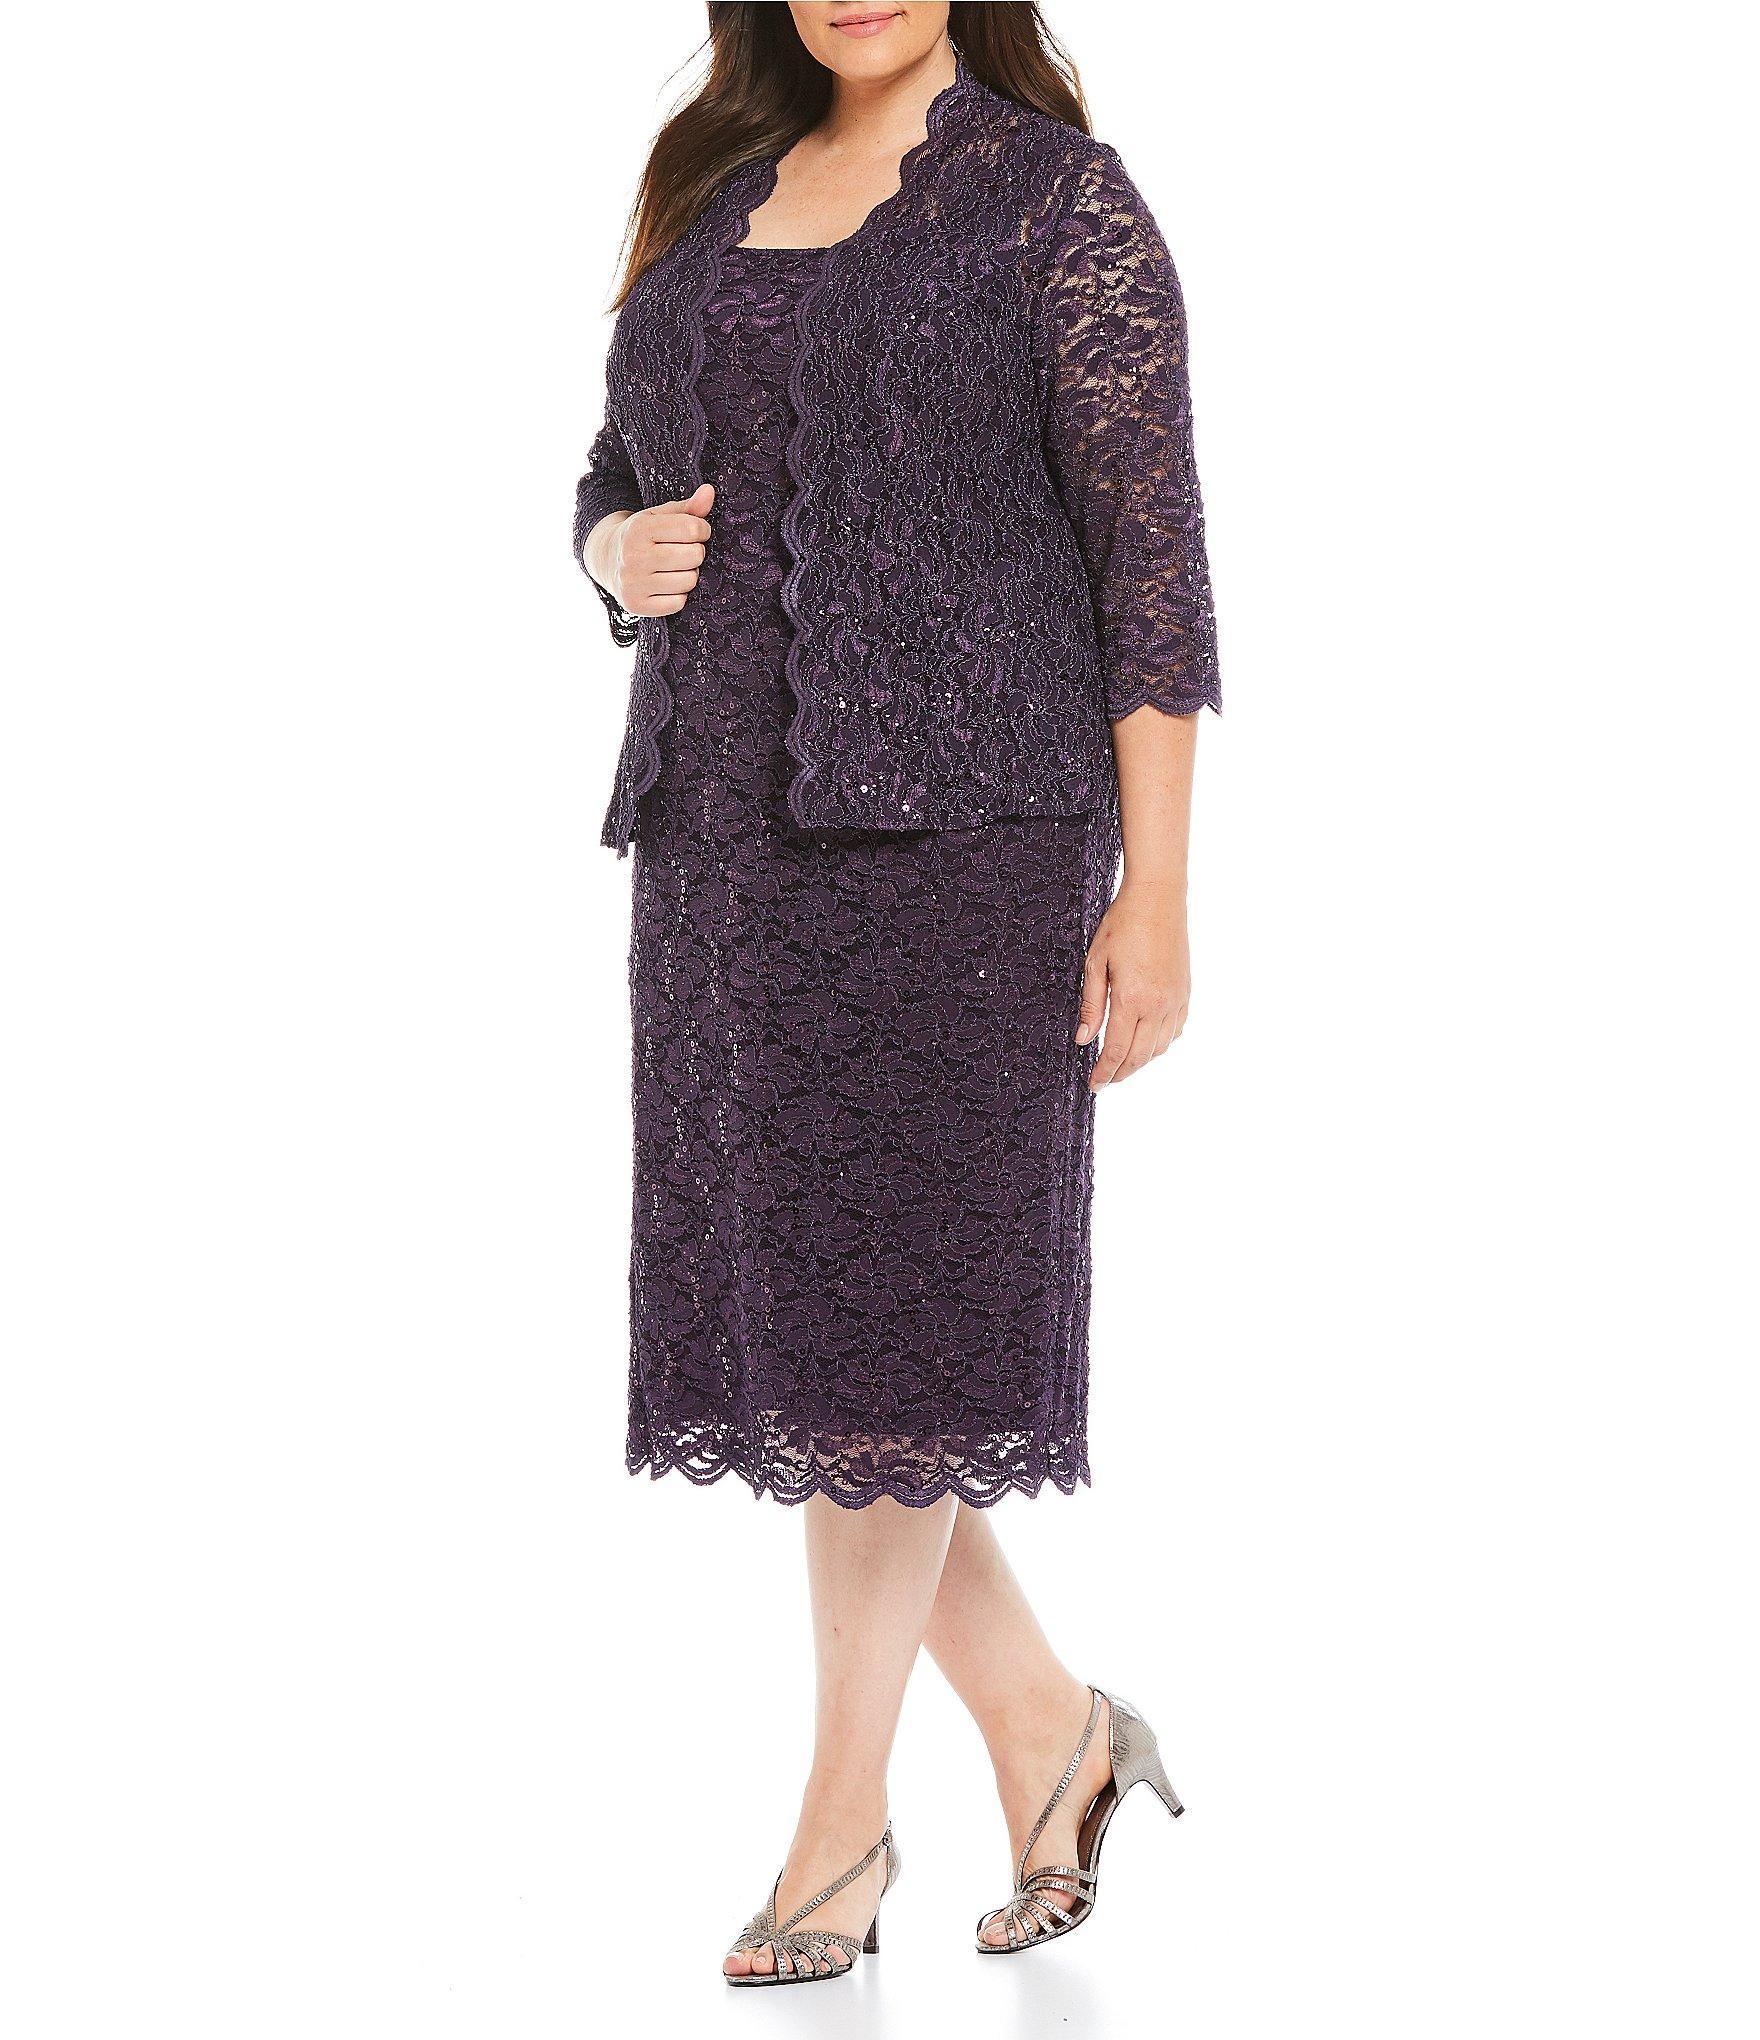 Eggplant Purple Women S Clothing Apparel Dillard S Dillard S